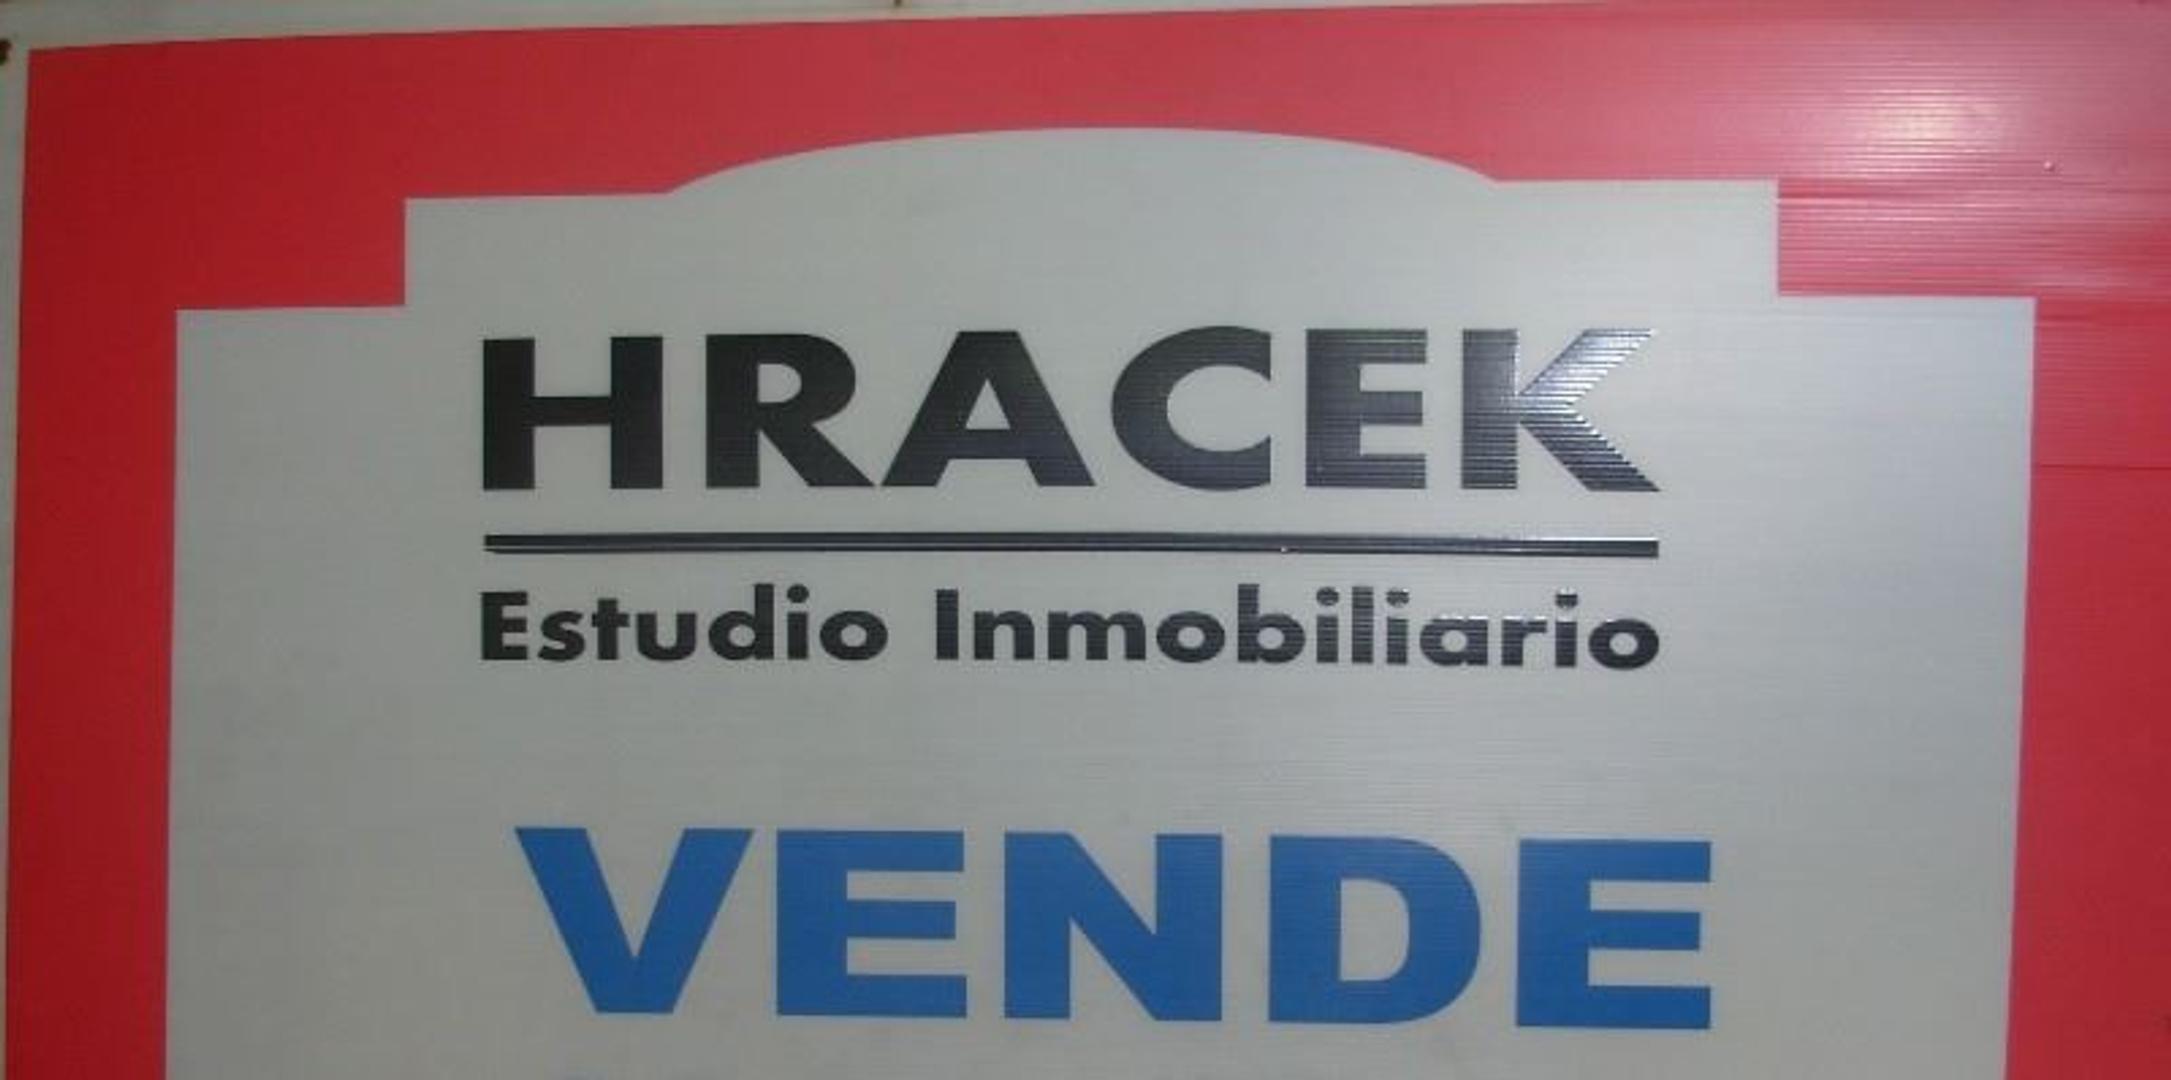 Lote ideal inversores a 3 cuadras de Rivadavia en Ituzaingo Norte 16x46